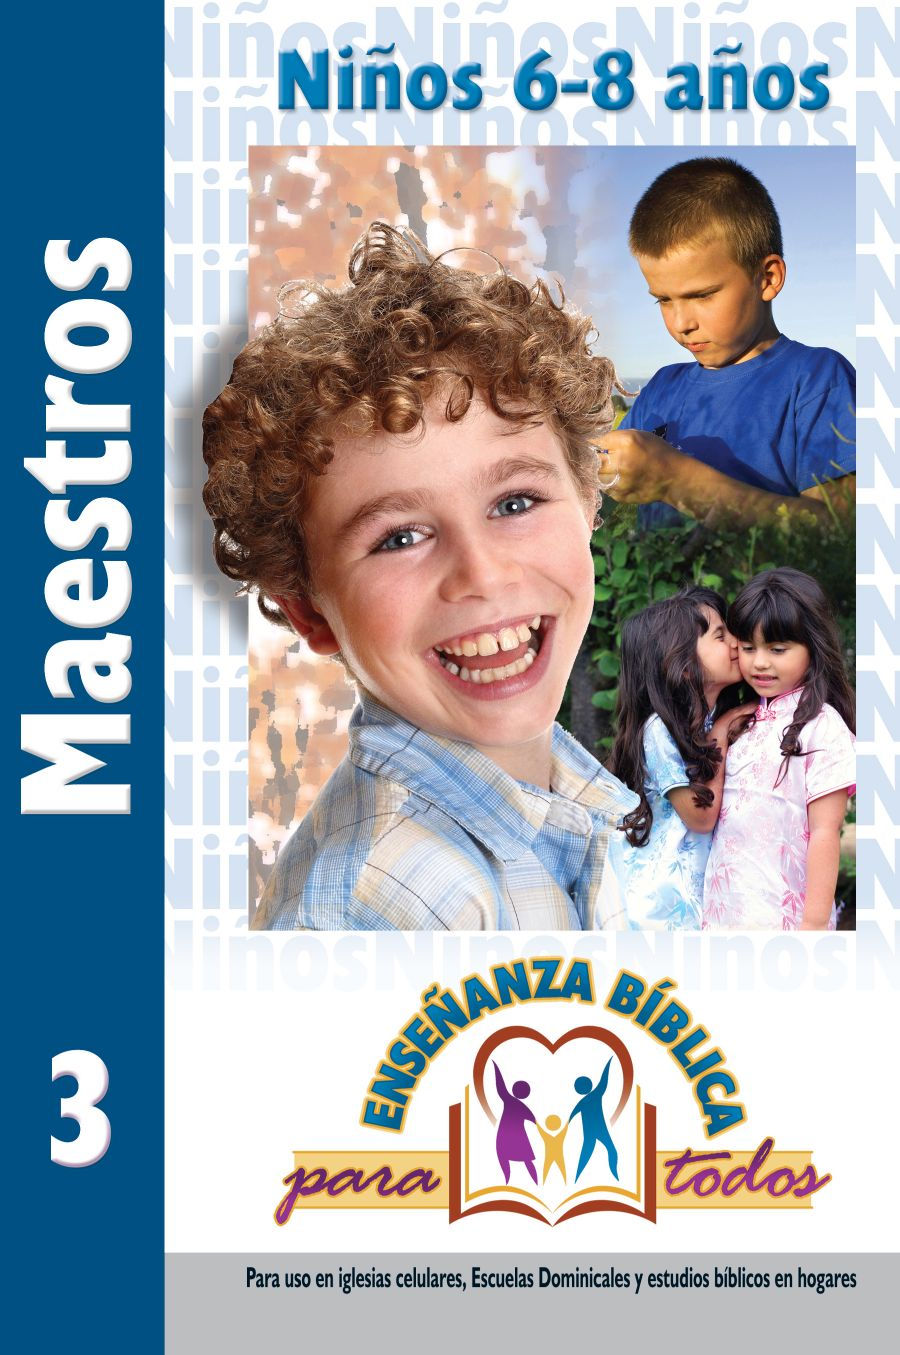 Ebpt 3 maestros de ninos de 6 a 8 anos by editorial for Sillas para ninos de 3 a 6 anos